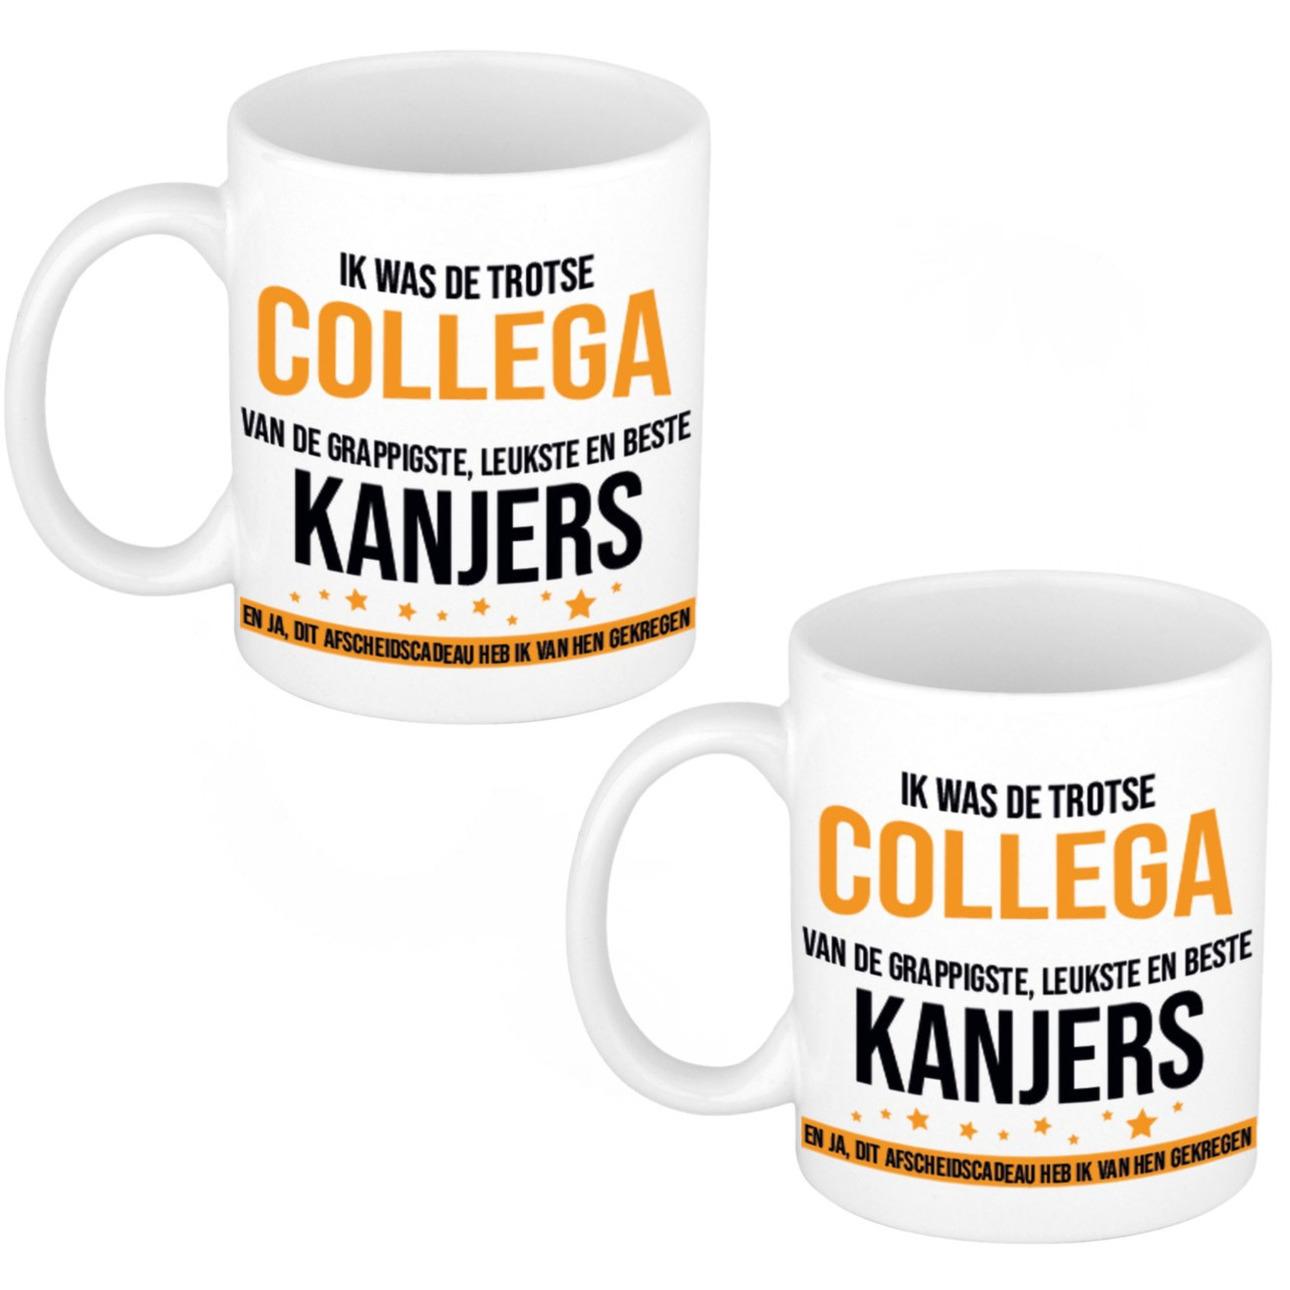 6x stuks trotse collega kanjers afscheidscadeau koffiemok - theebeker 300 ml